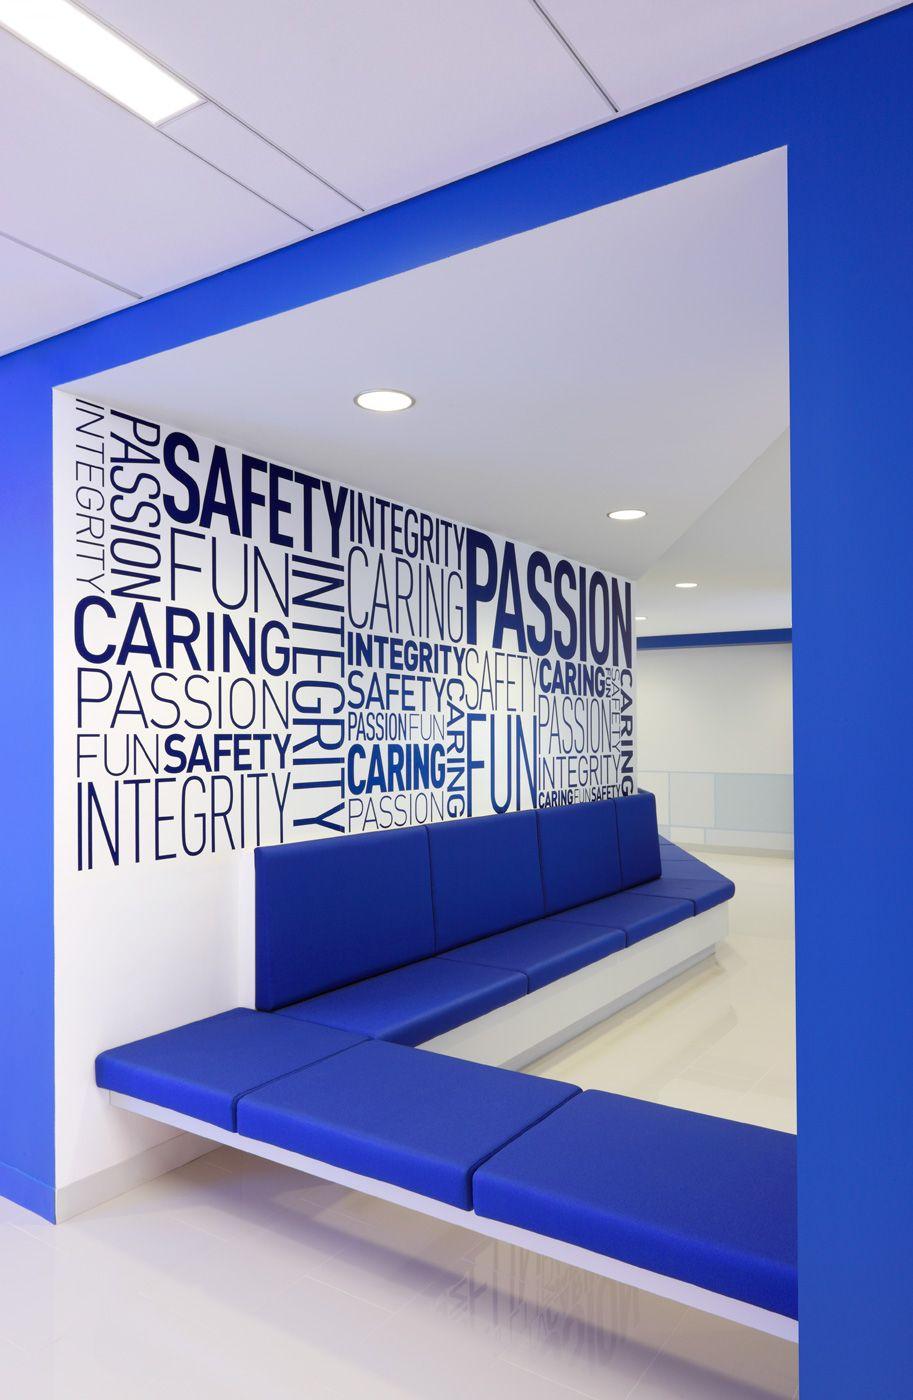 JetBlue, NY #jetblue #airline #furniture #blue www ...